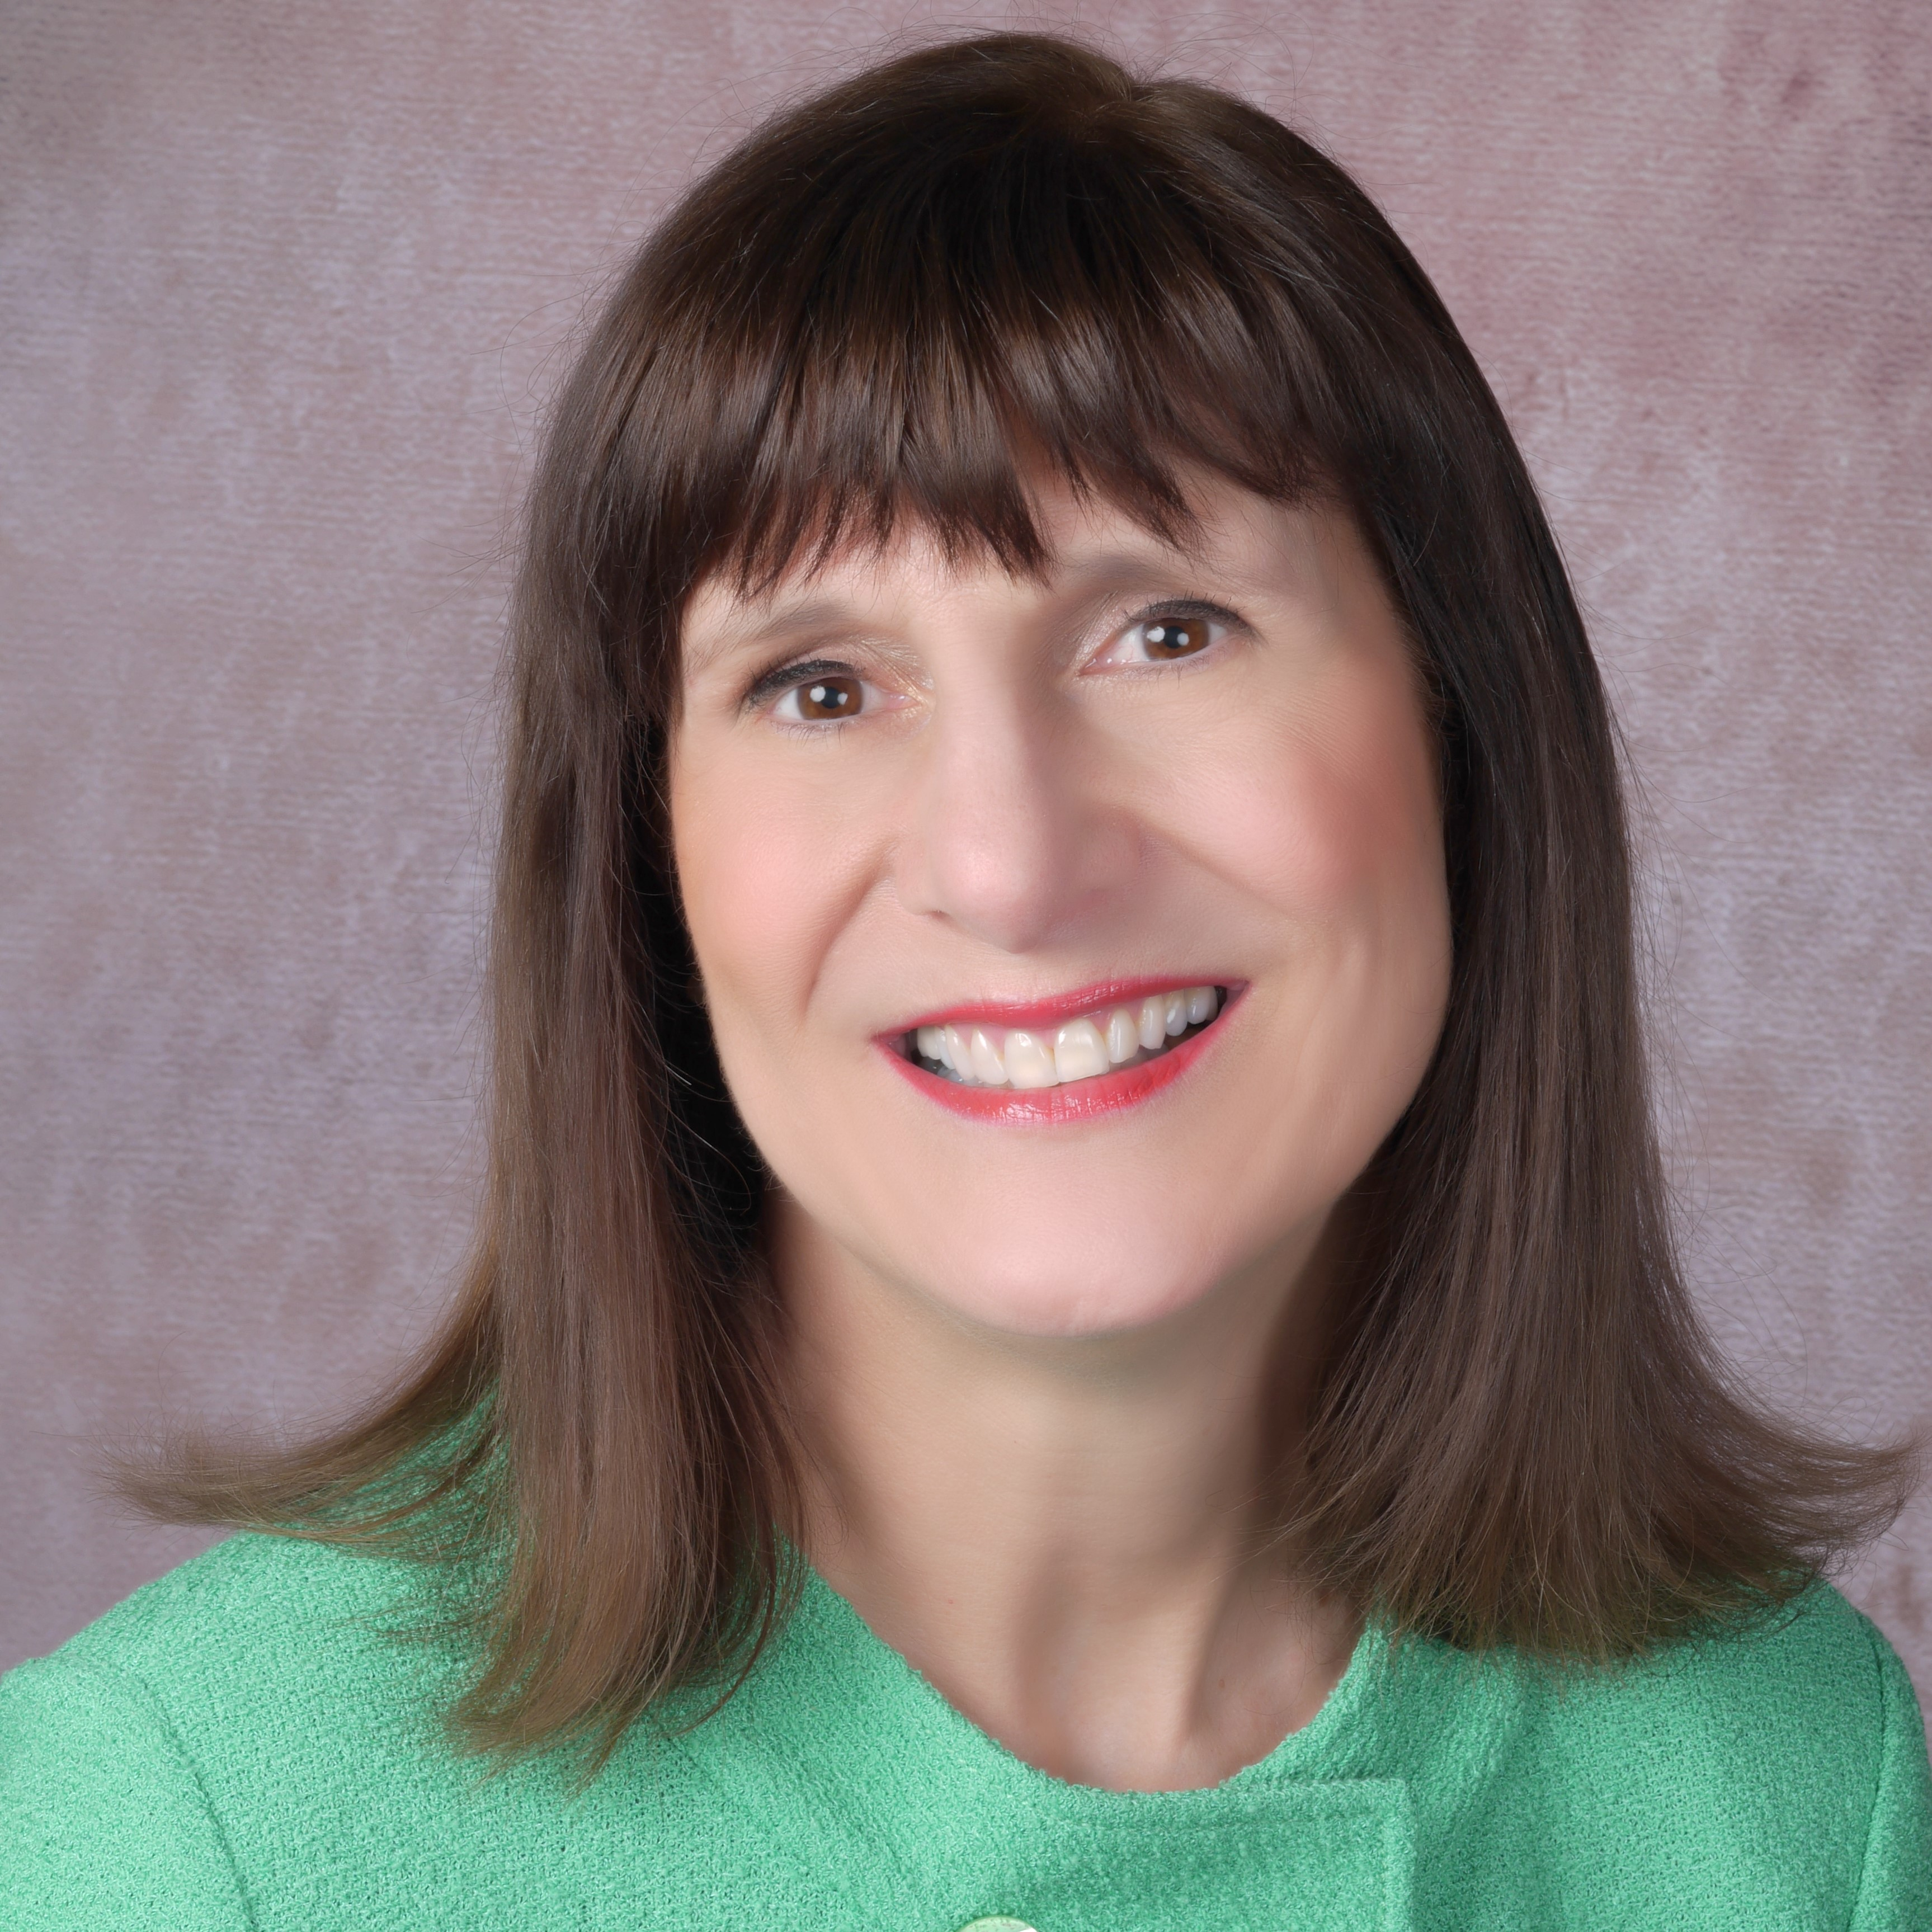 Susan Scanland